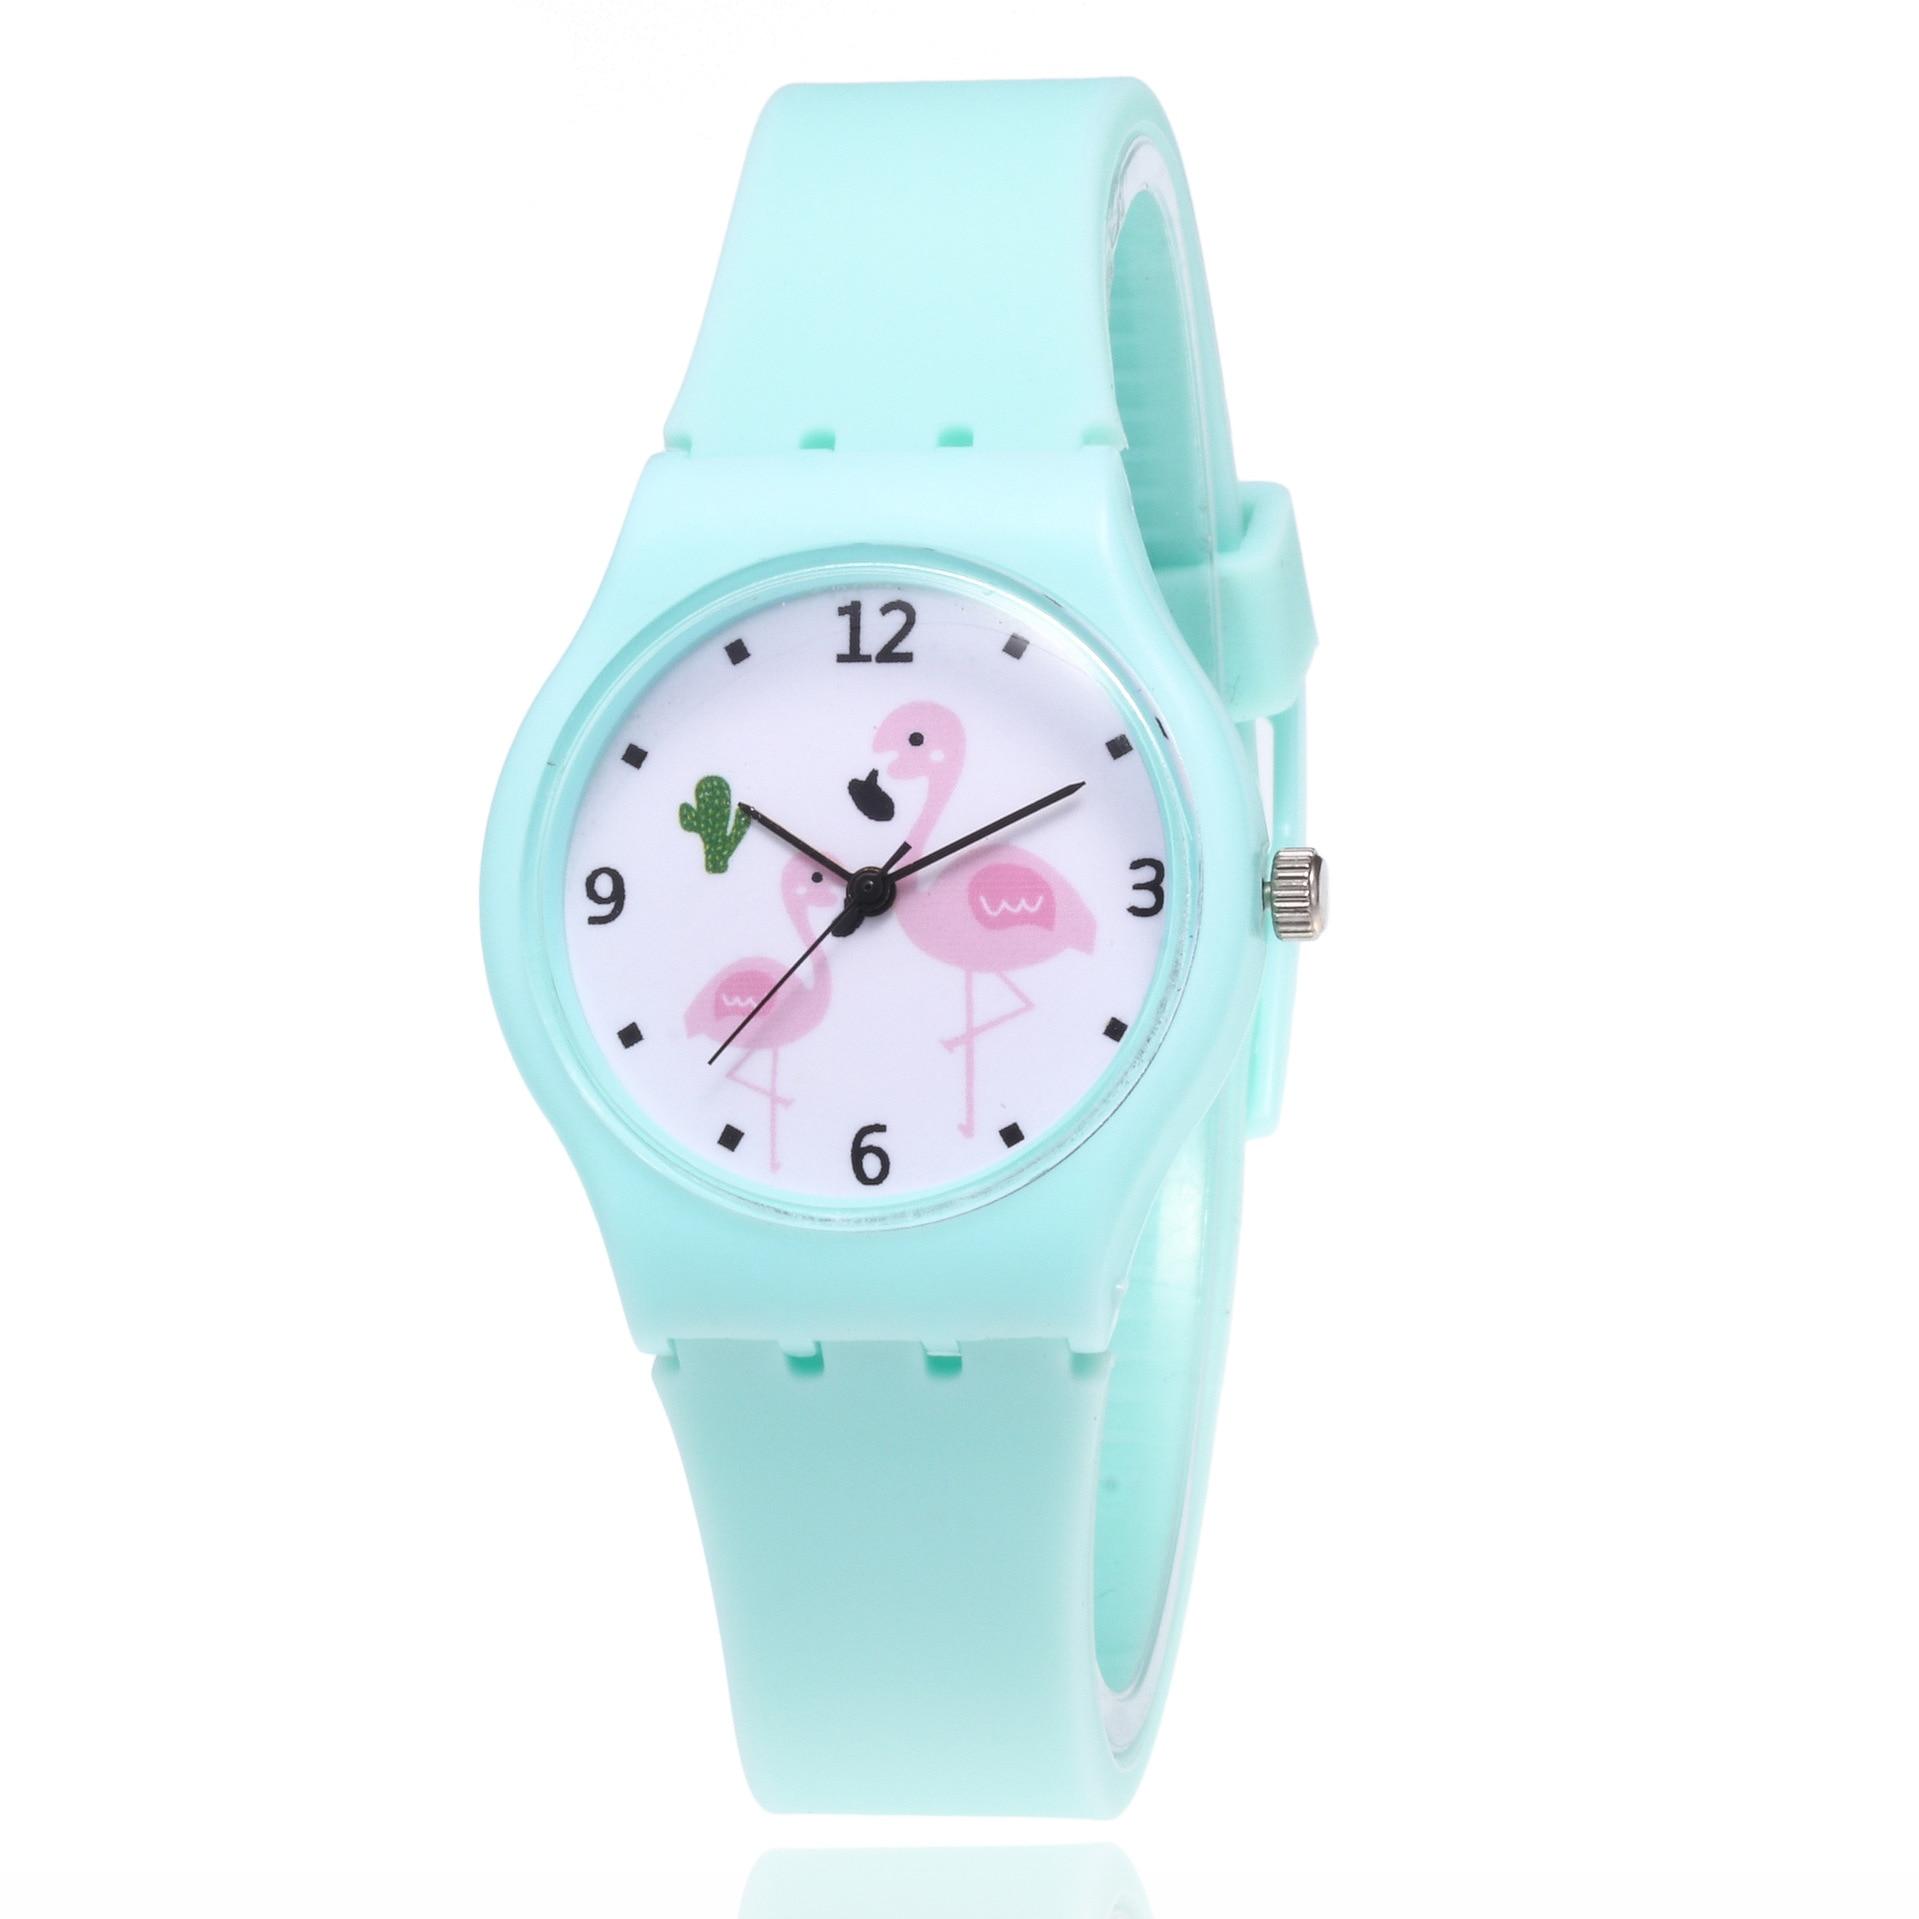 Flamingo Cartoon Watches Kid Girls Silicone Strap Wristwatch Kids Fashion Quartz Watch Cute Clock Montre Enfant Bayan Kol Saati